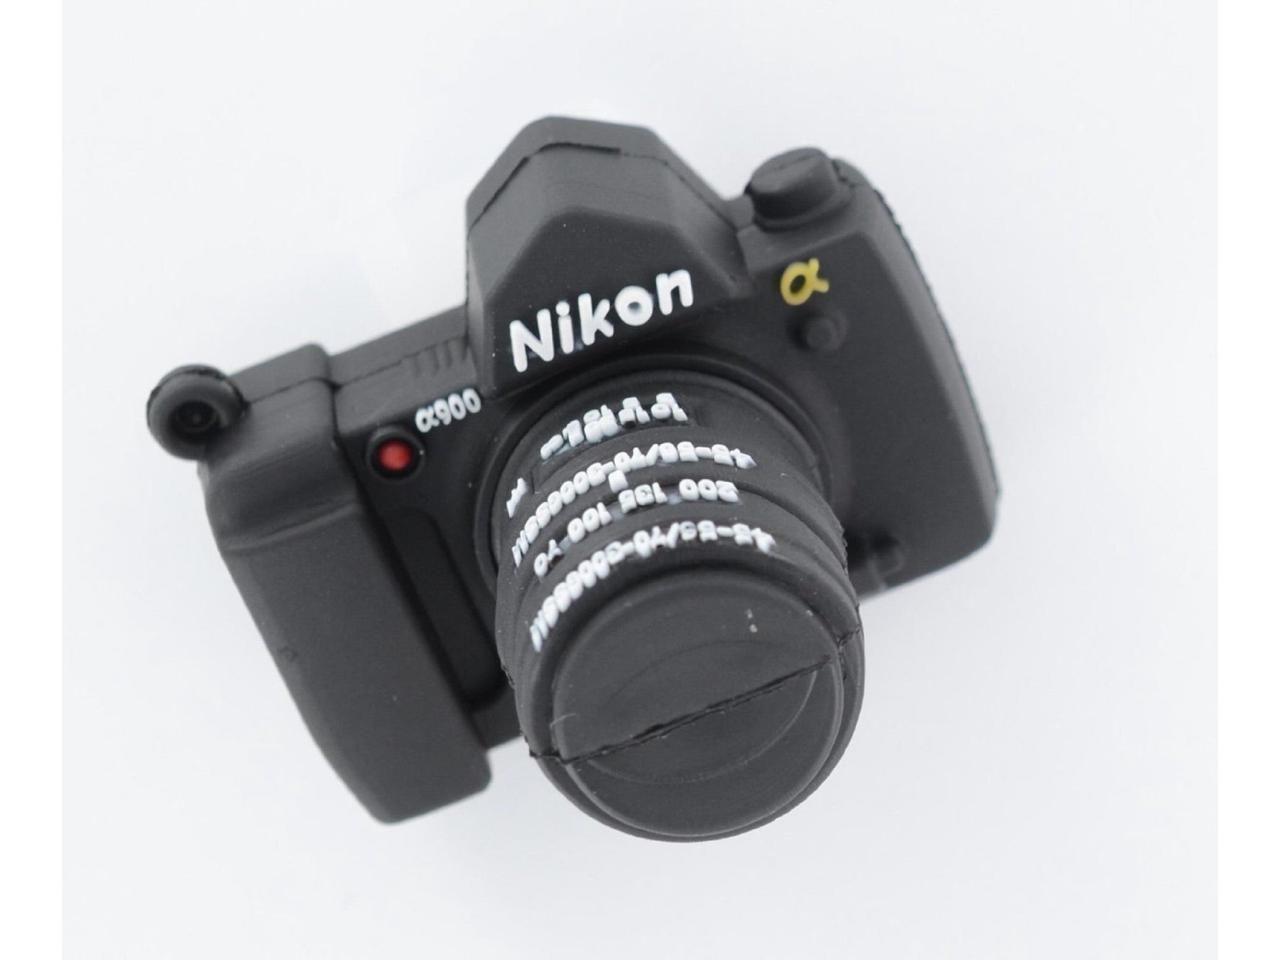 Additional Nikon mirrorless full frame camera specifications